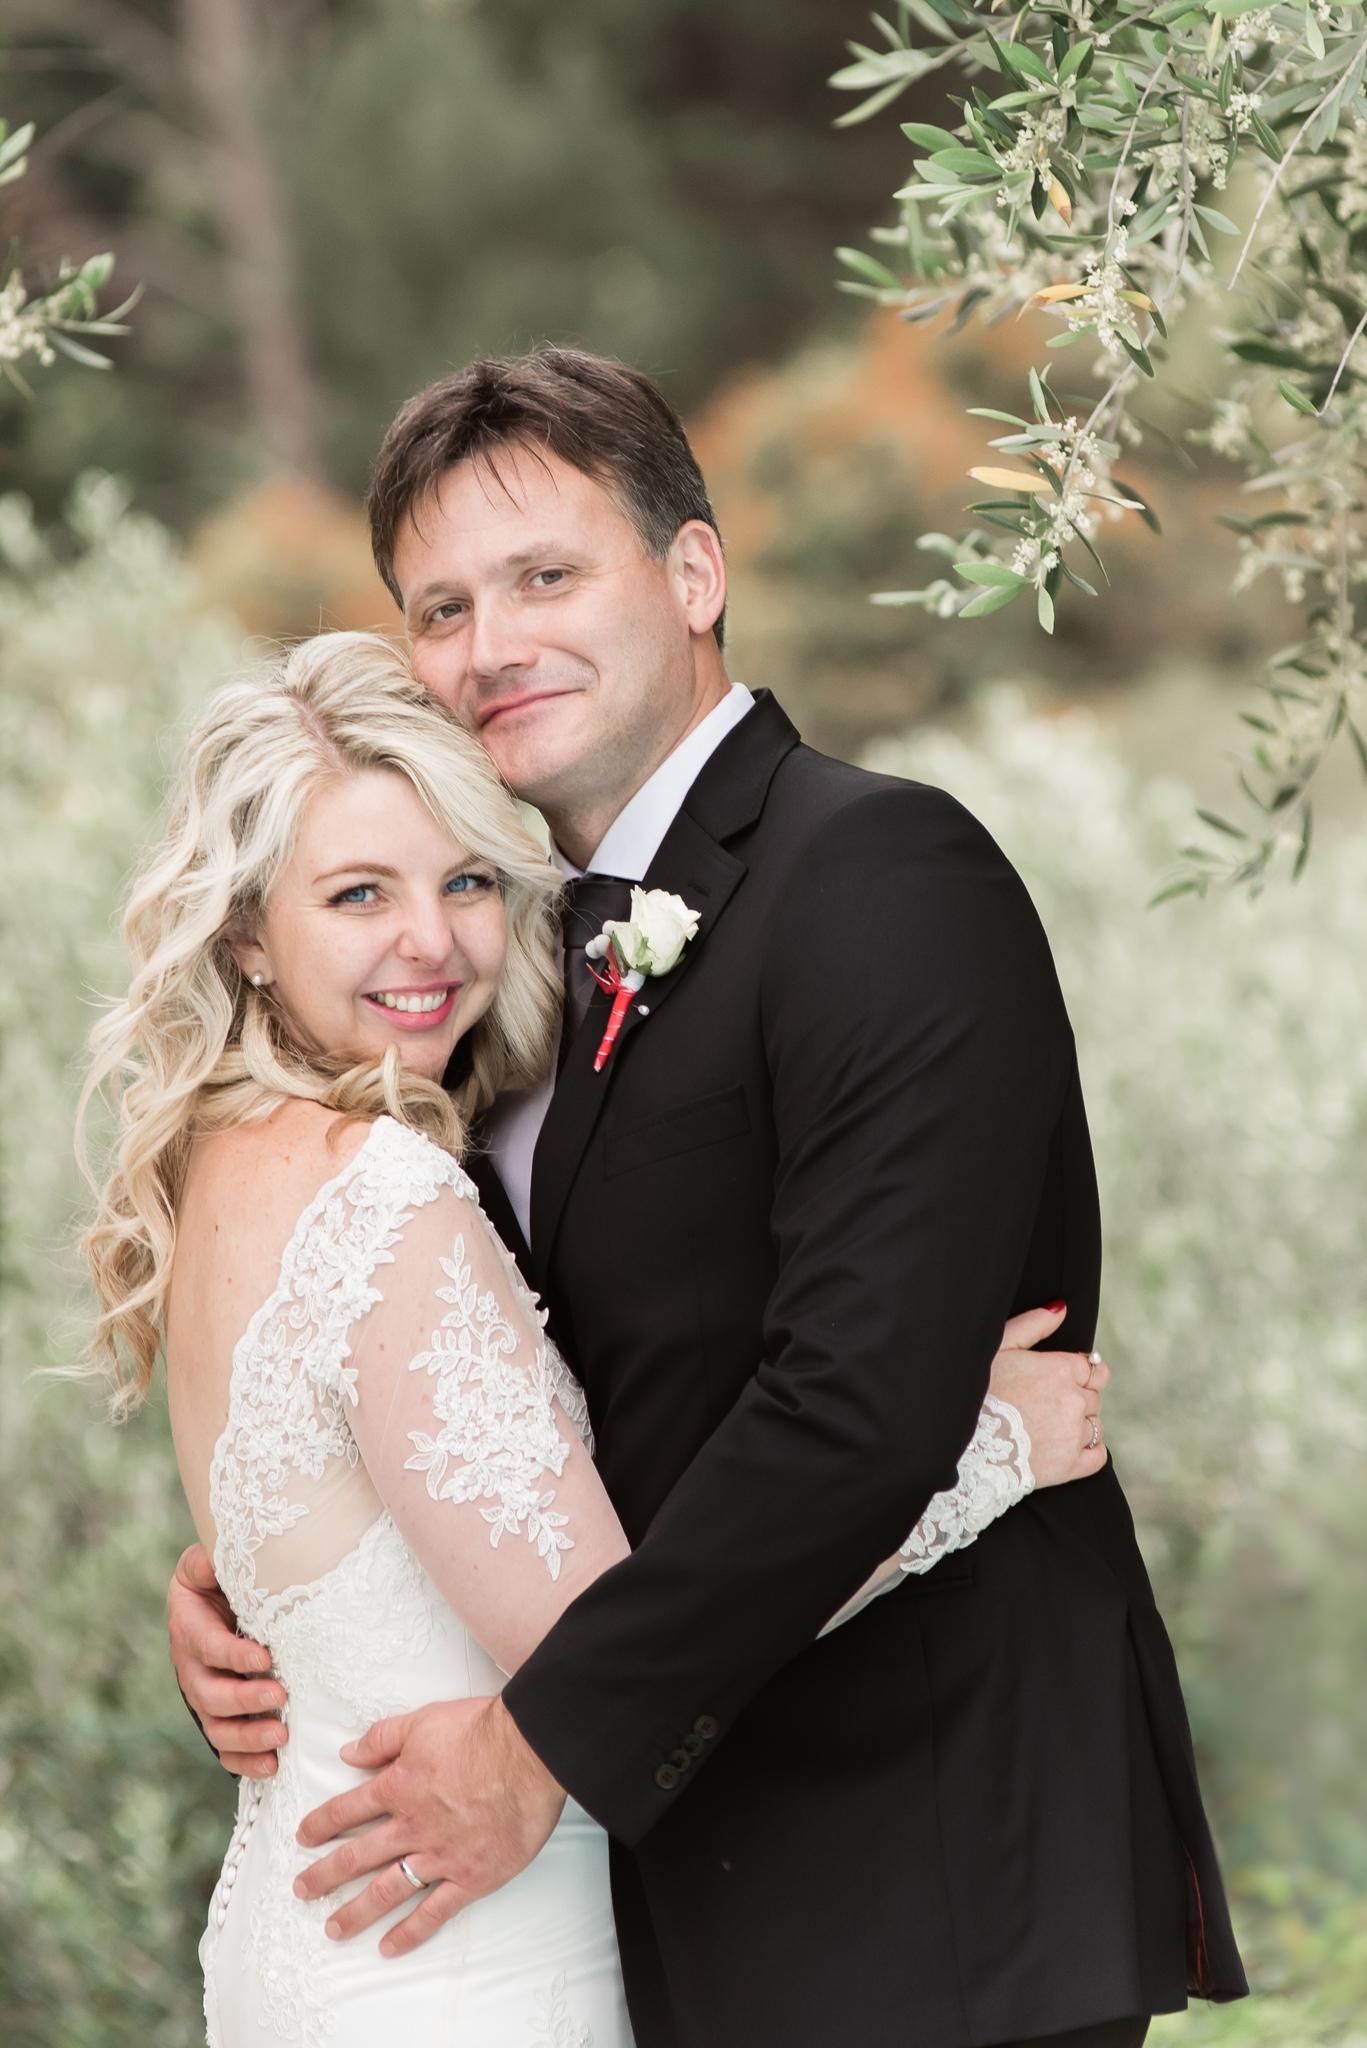 Angelique_Smith_Photography_Pieter&Yvonne_Wedding-448.jpg